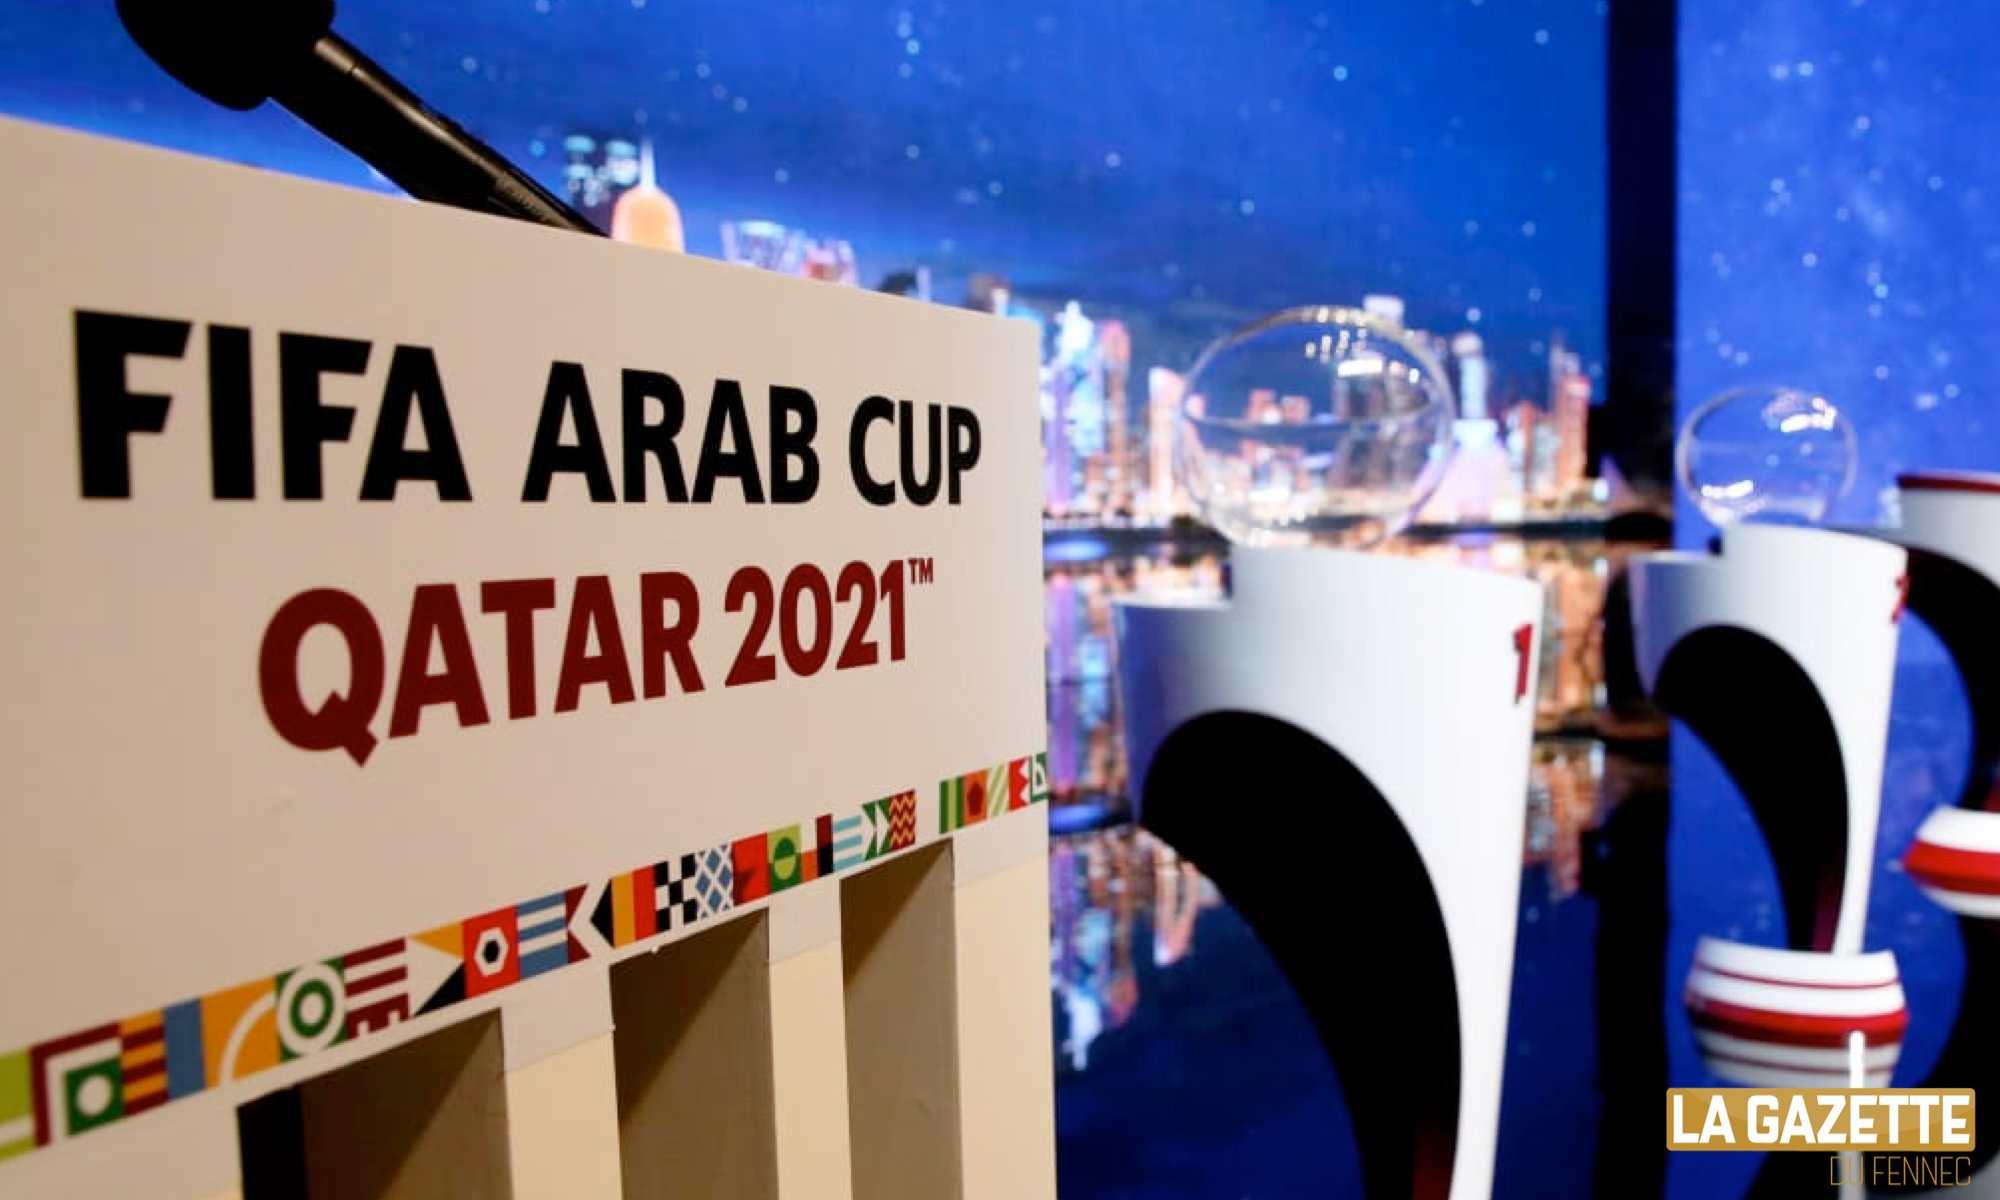 tirage qatar arab cup 2021